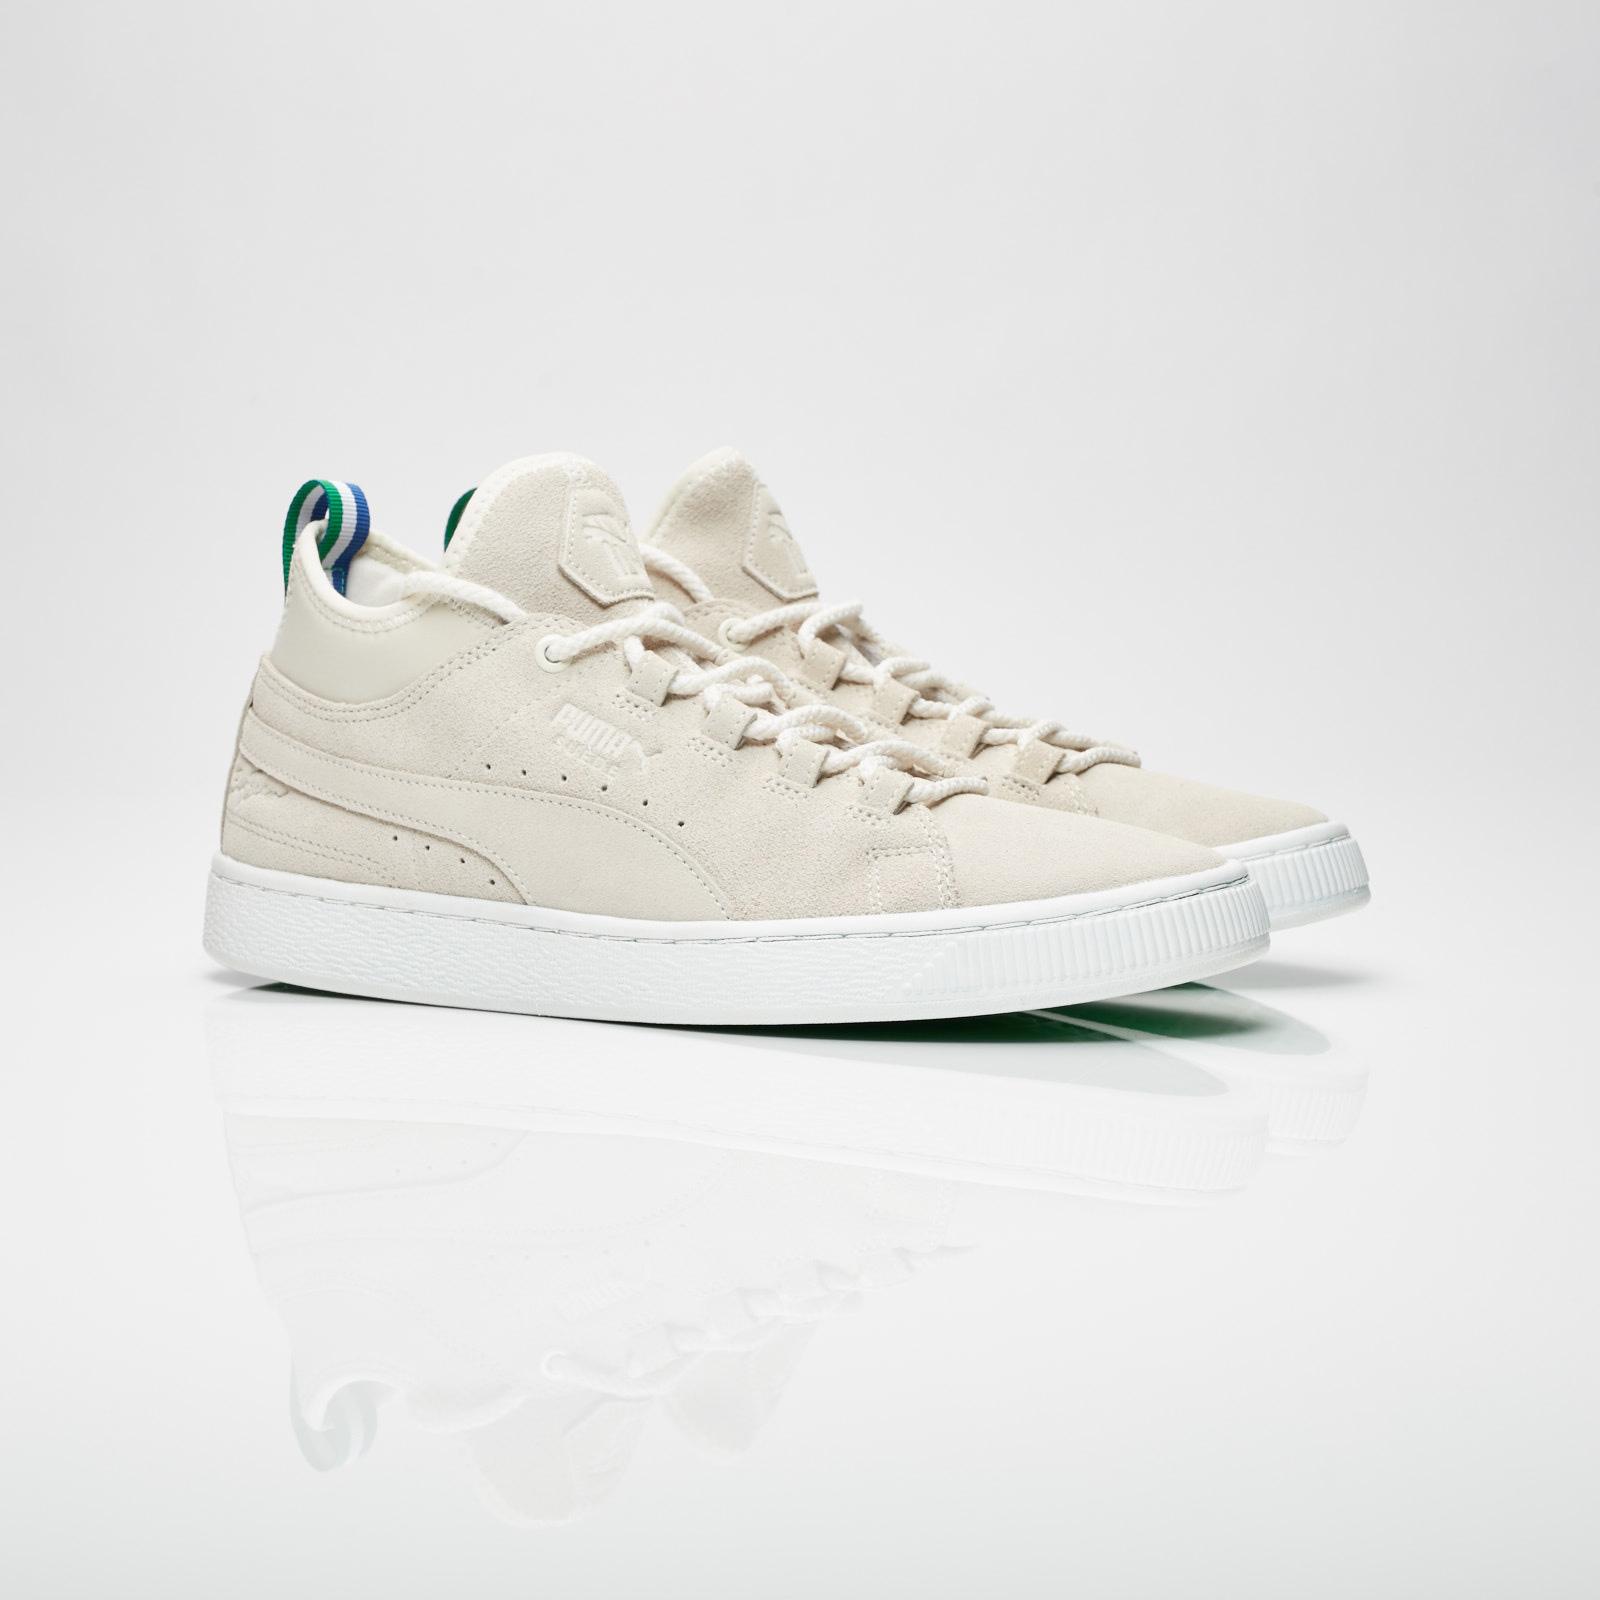 Puma Suede Classic x Big Sean - 366300-01 - Sneakersnstuff ... f4849ddfd